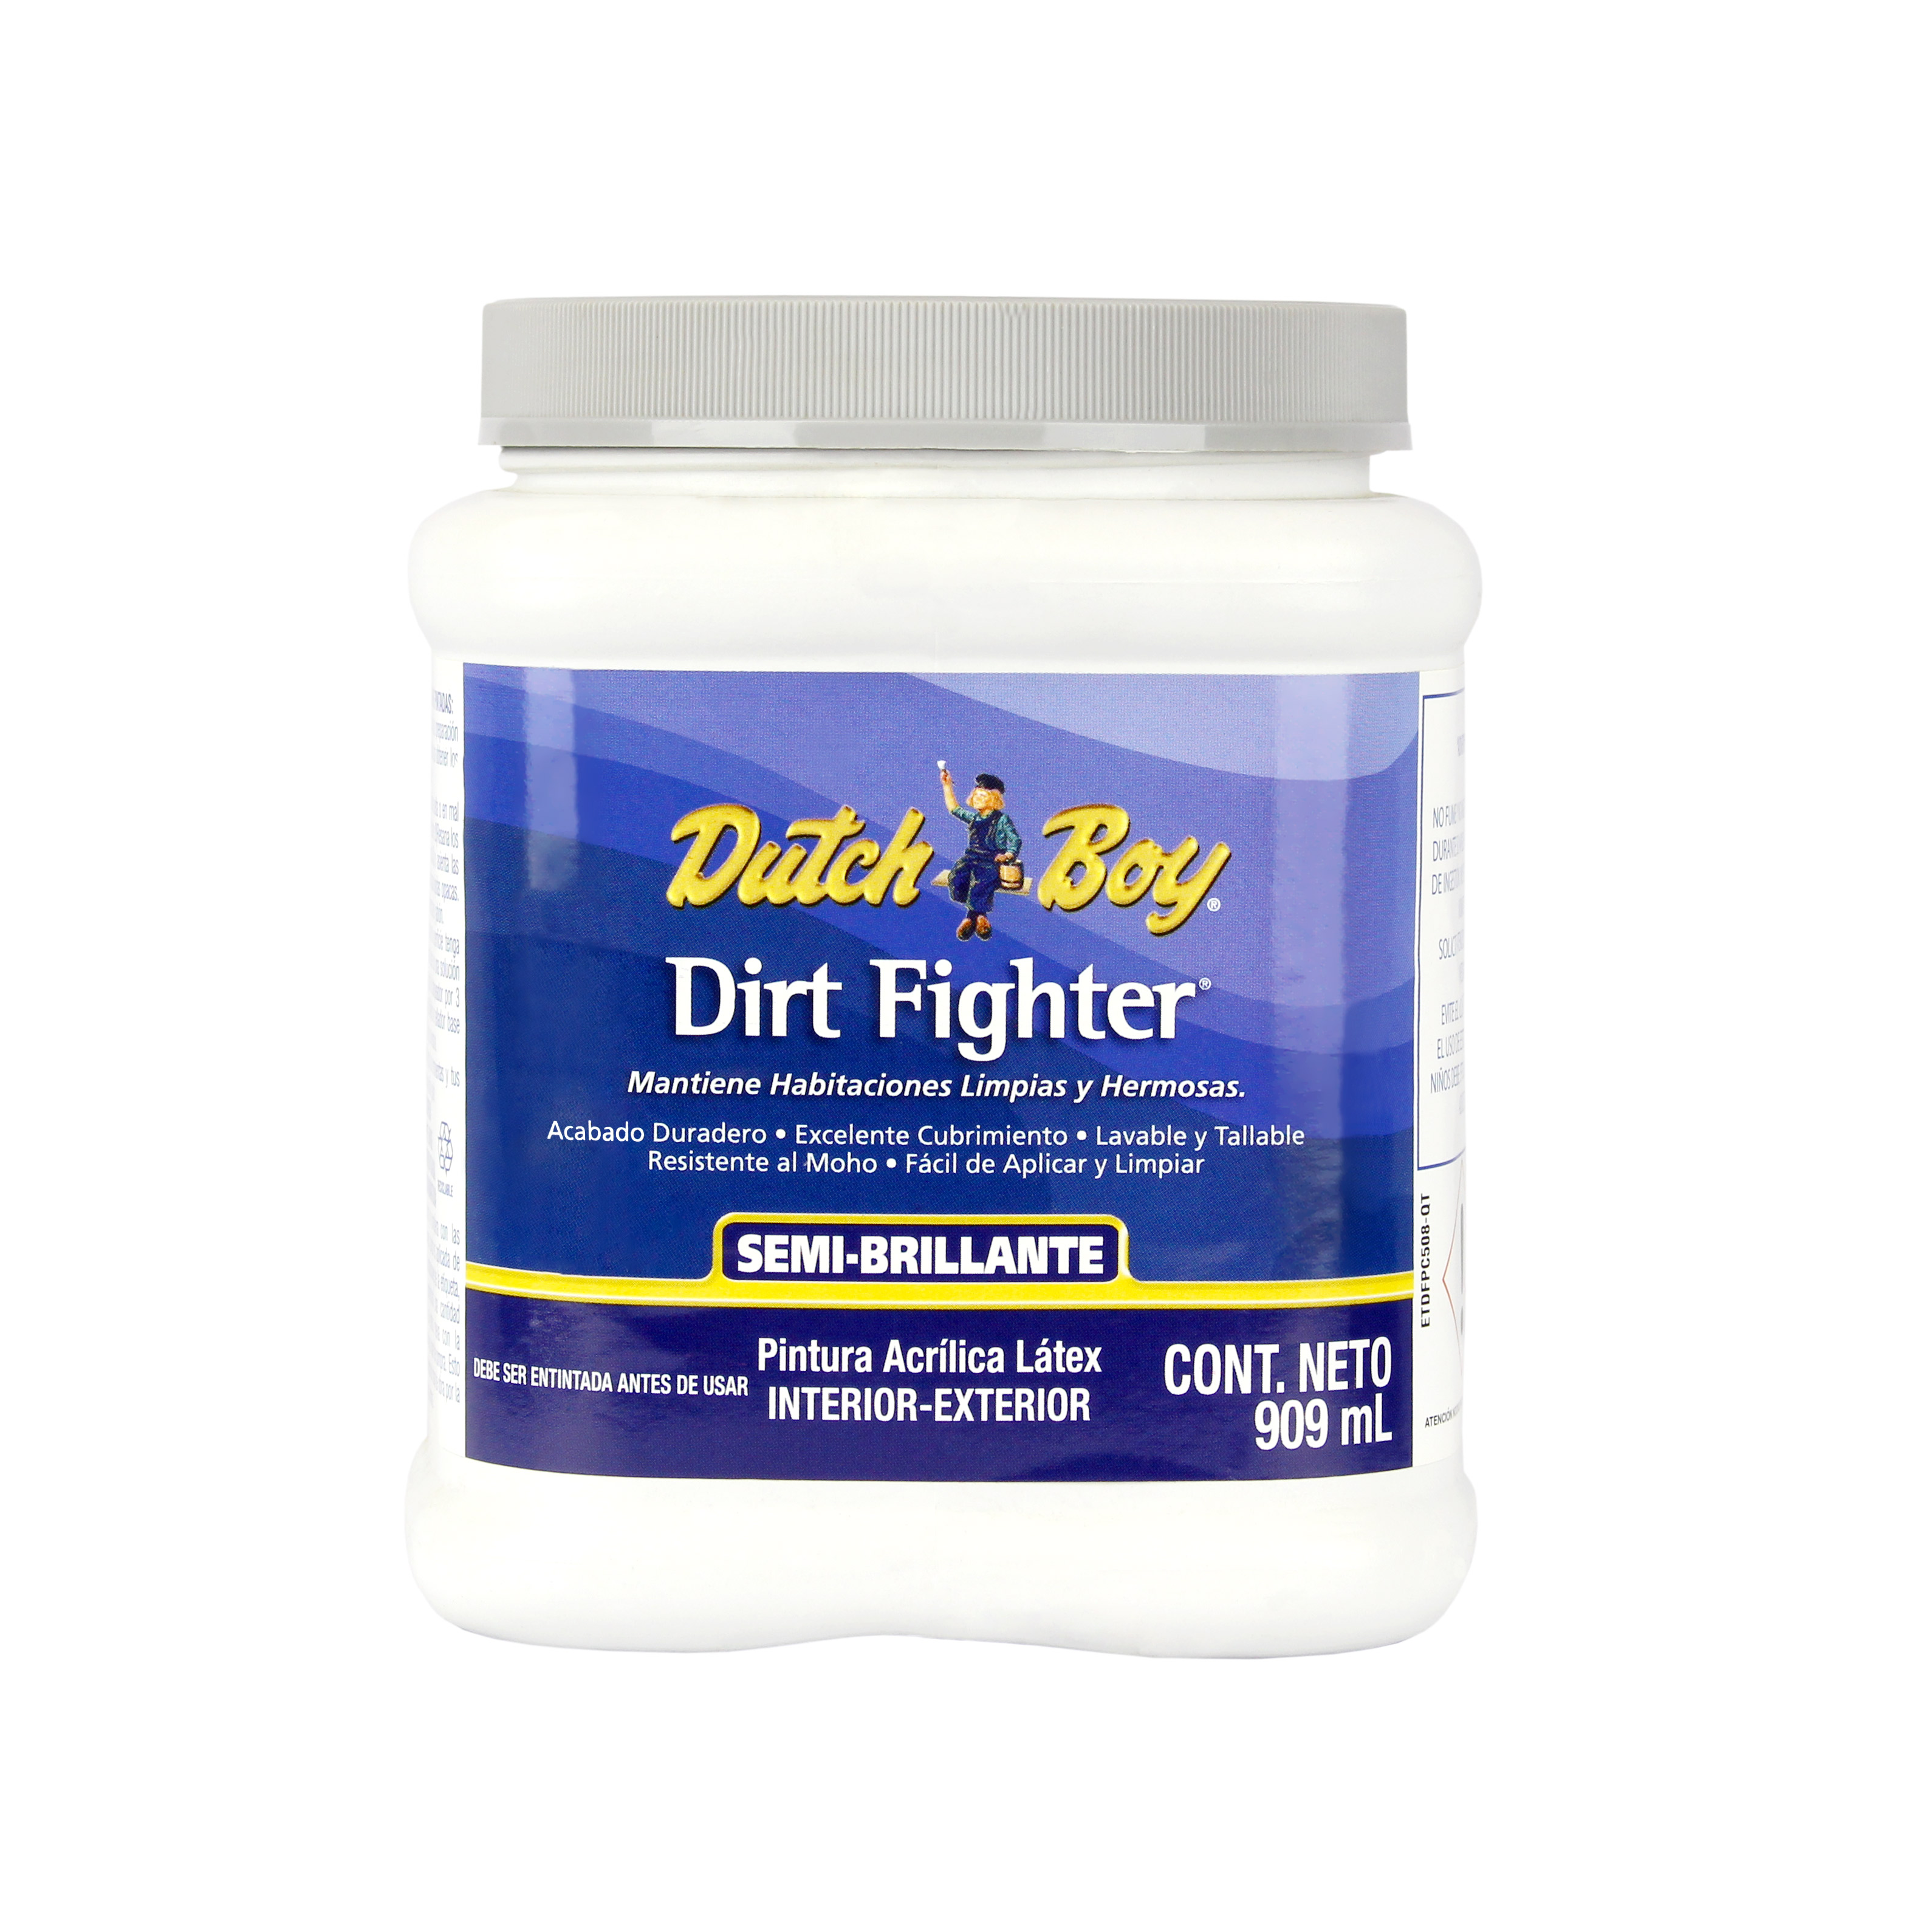 pintura acrilica semi brillante dirt fighter dutch boy 1 lt